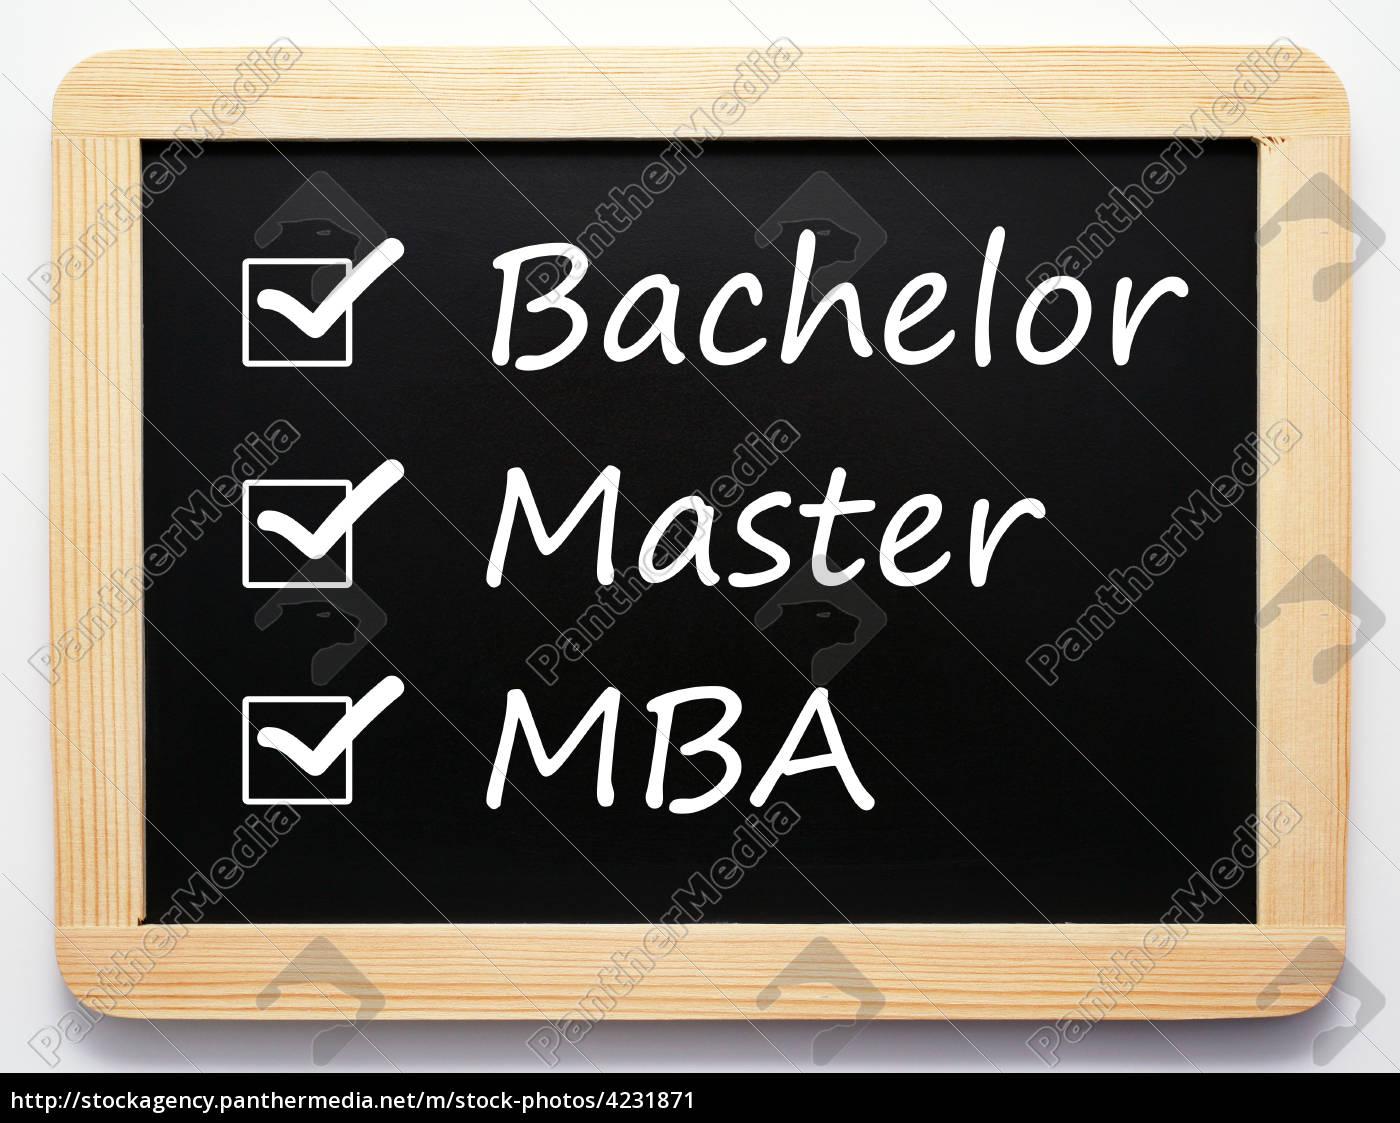 Bachelor Master MBA - Career Concept - Lizenzfreies Bild - #4231871 ...